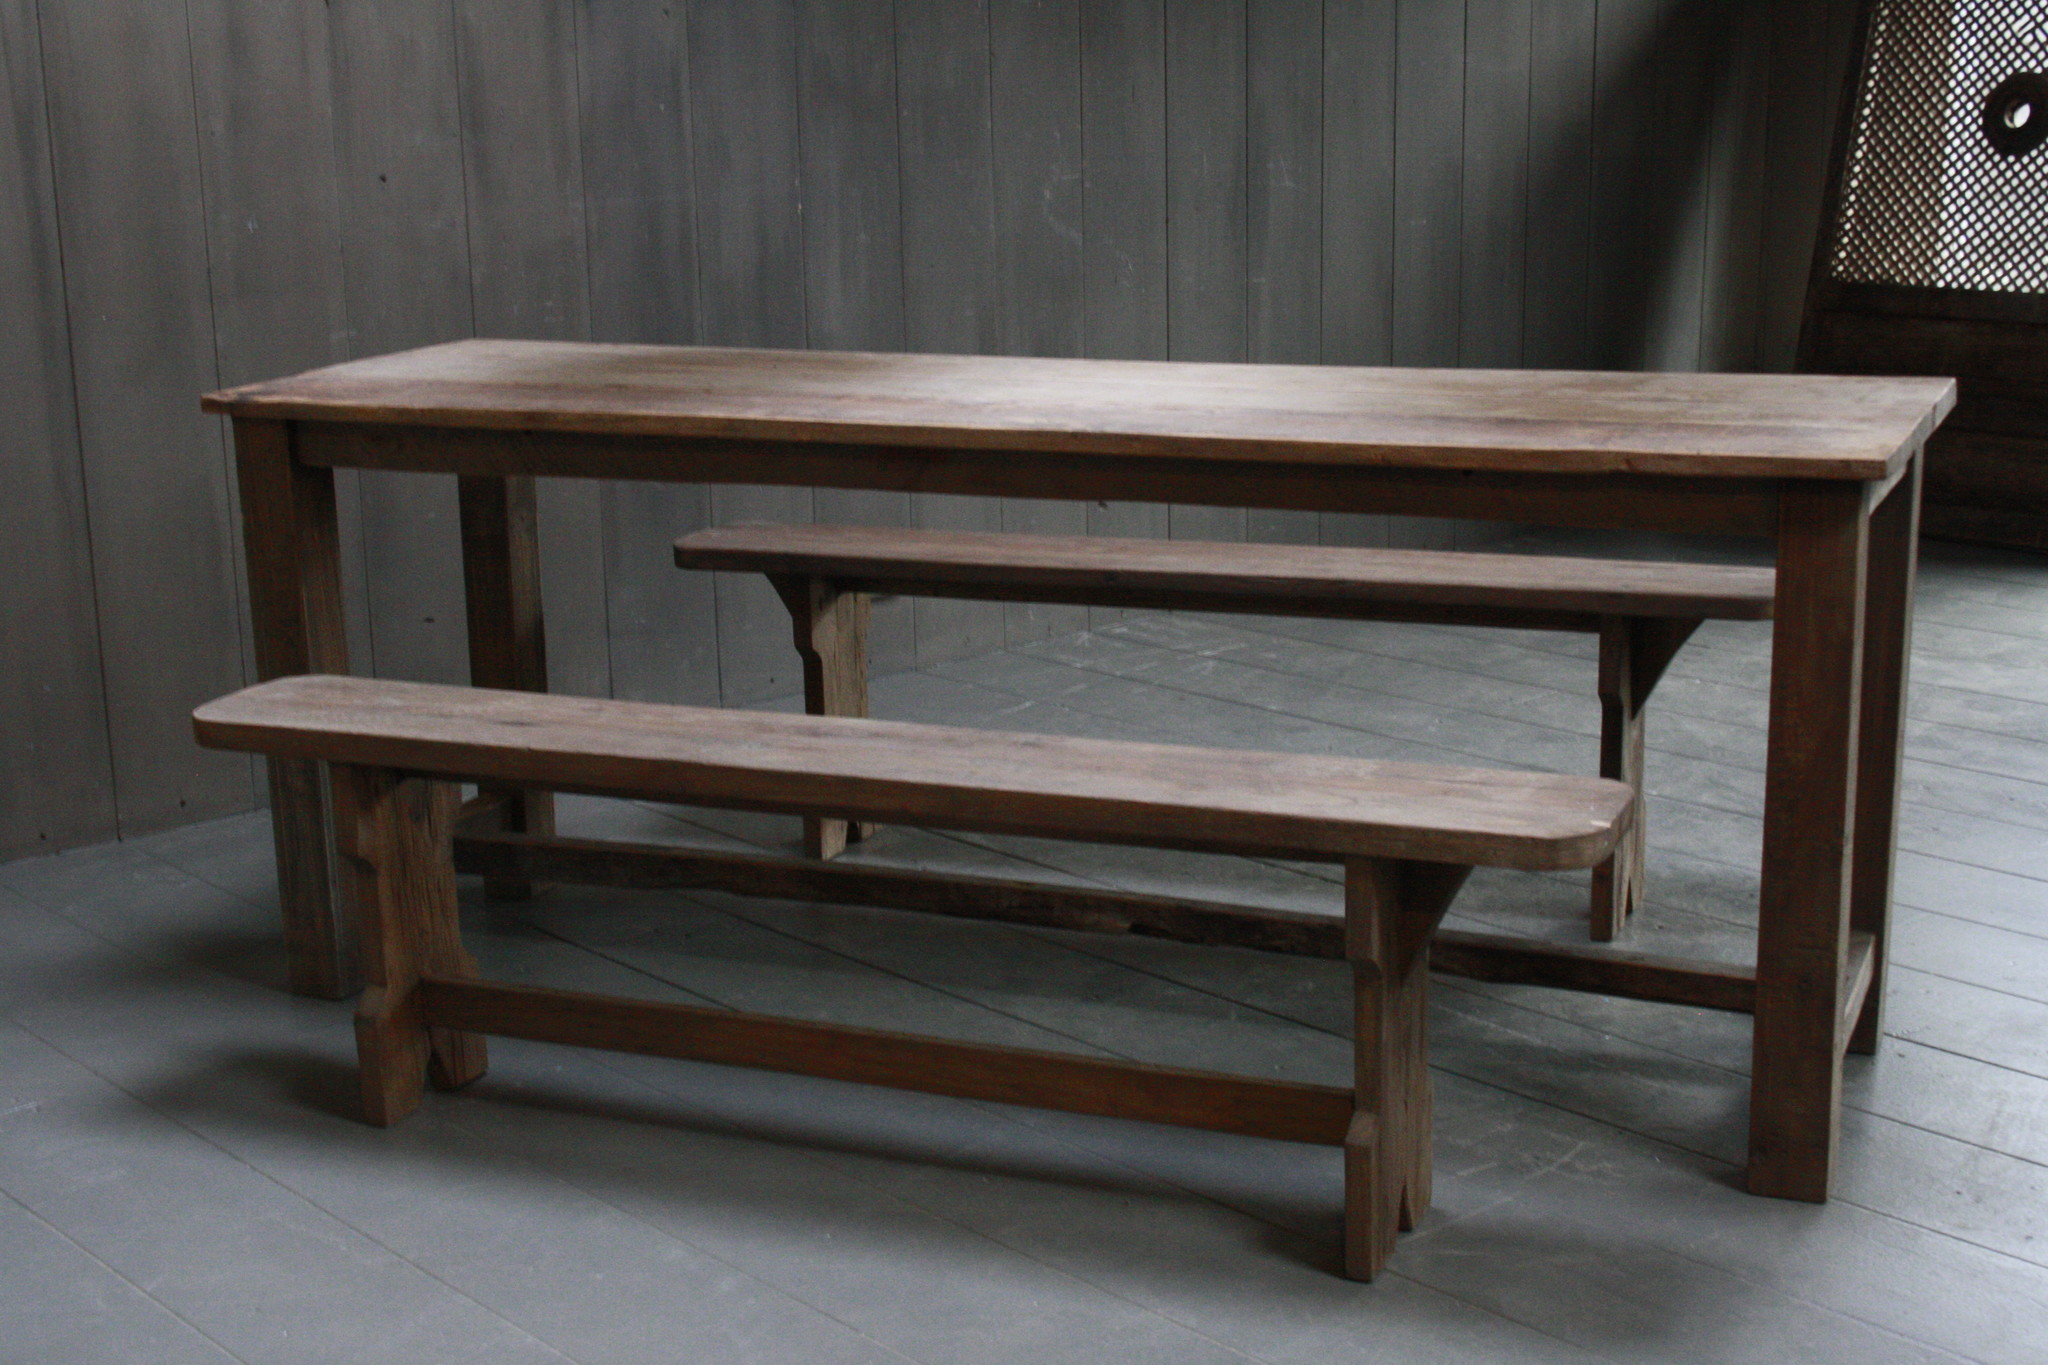 Oud houten eetkamer set met 2 houten bankjes-10